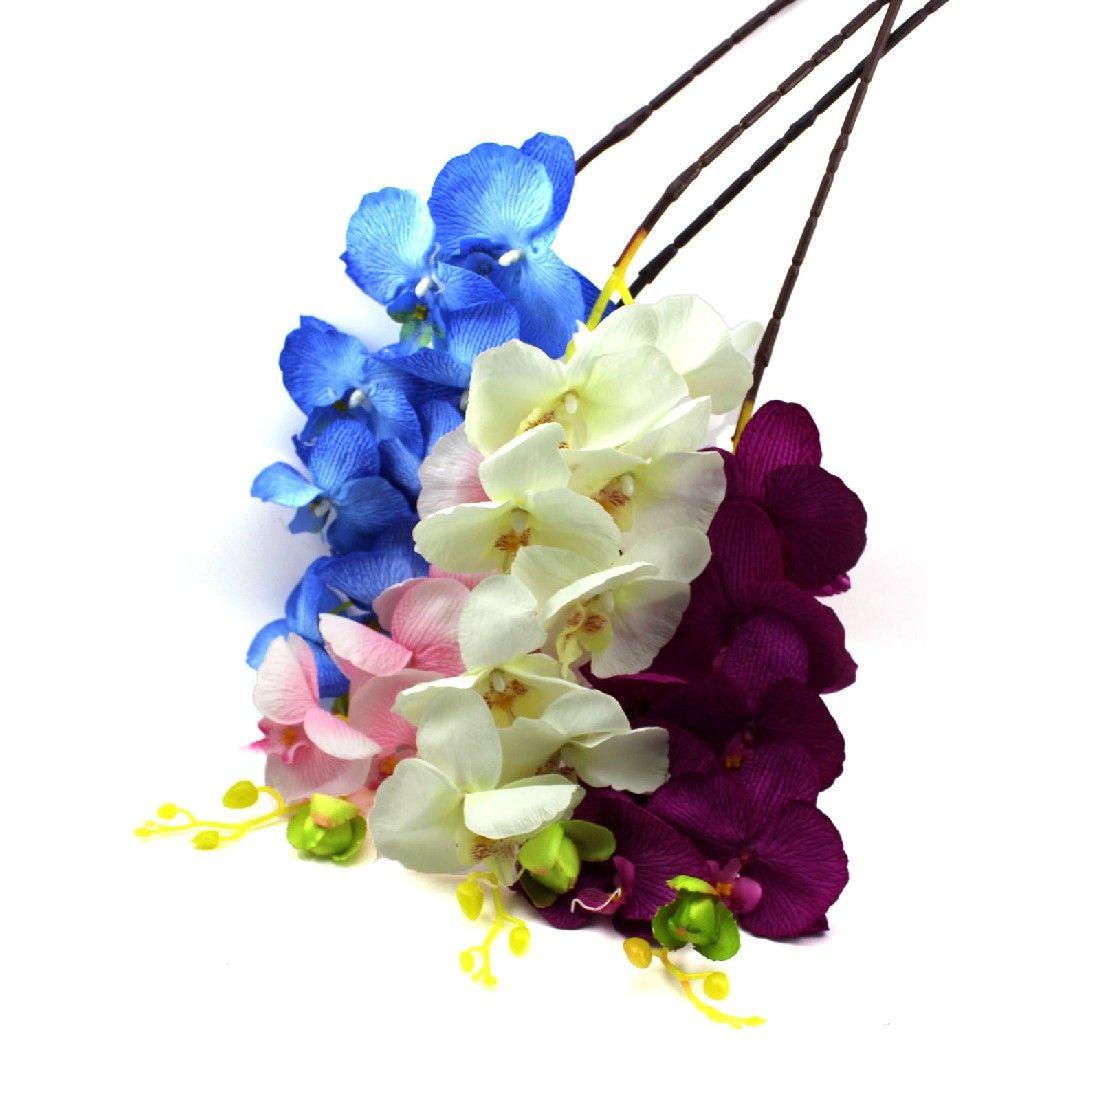 2016 new 8pcs artificial fake flower butterfly orchid silk flower 2016 new 8pcs artificial fake flower butterfly orchid silk flower home wedding party decor phalaenopsis flower izmirmasajfo